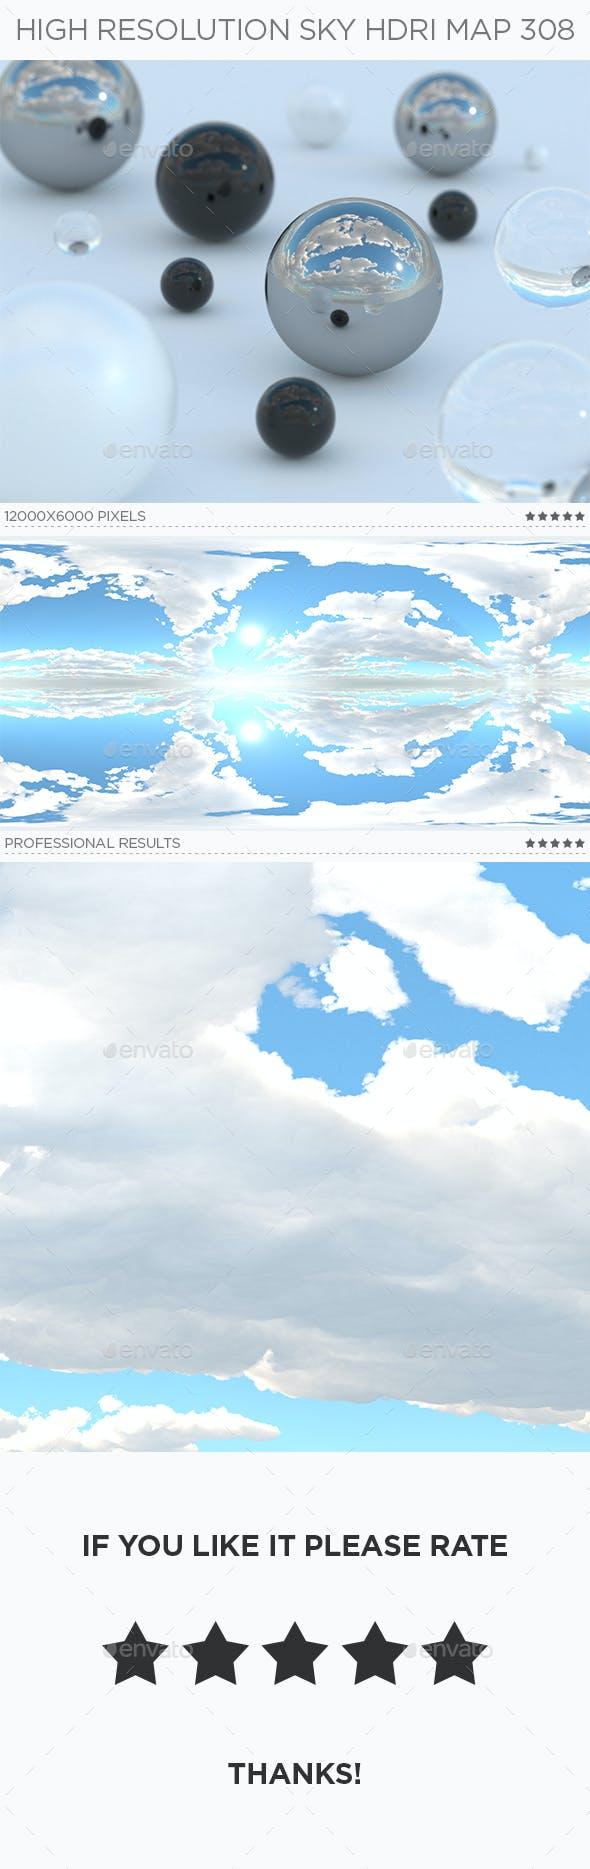 High Resolution Sky HDRi Map 308 - 3DOcean Item for Sale